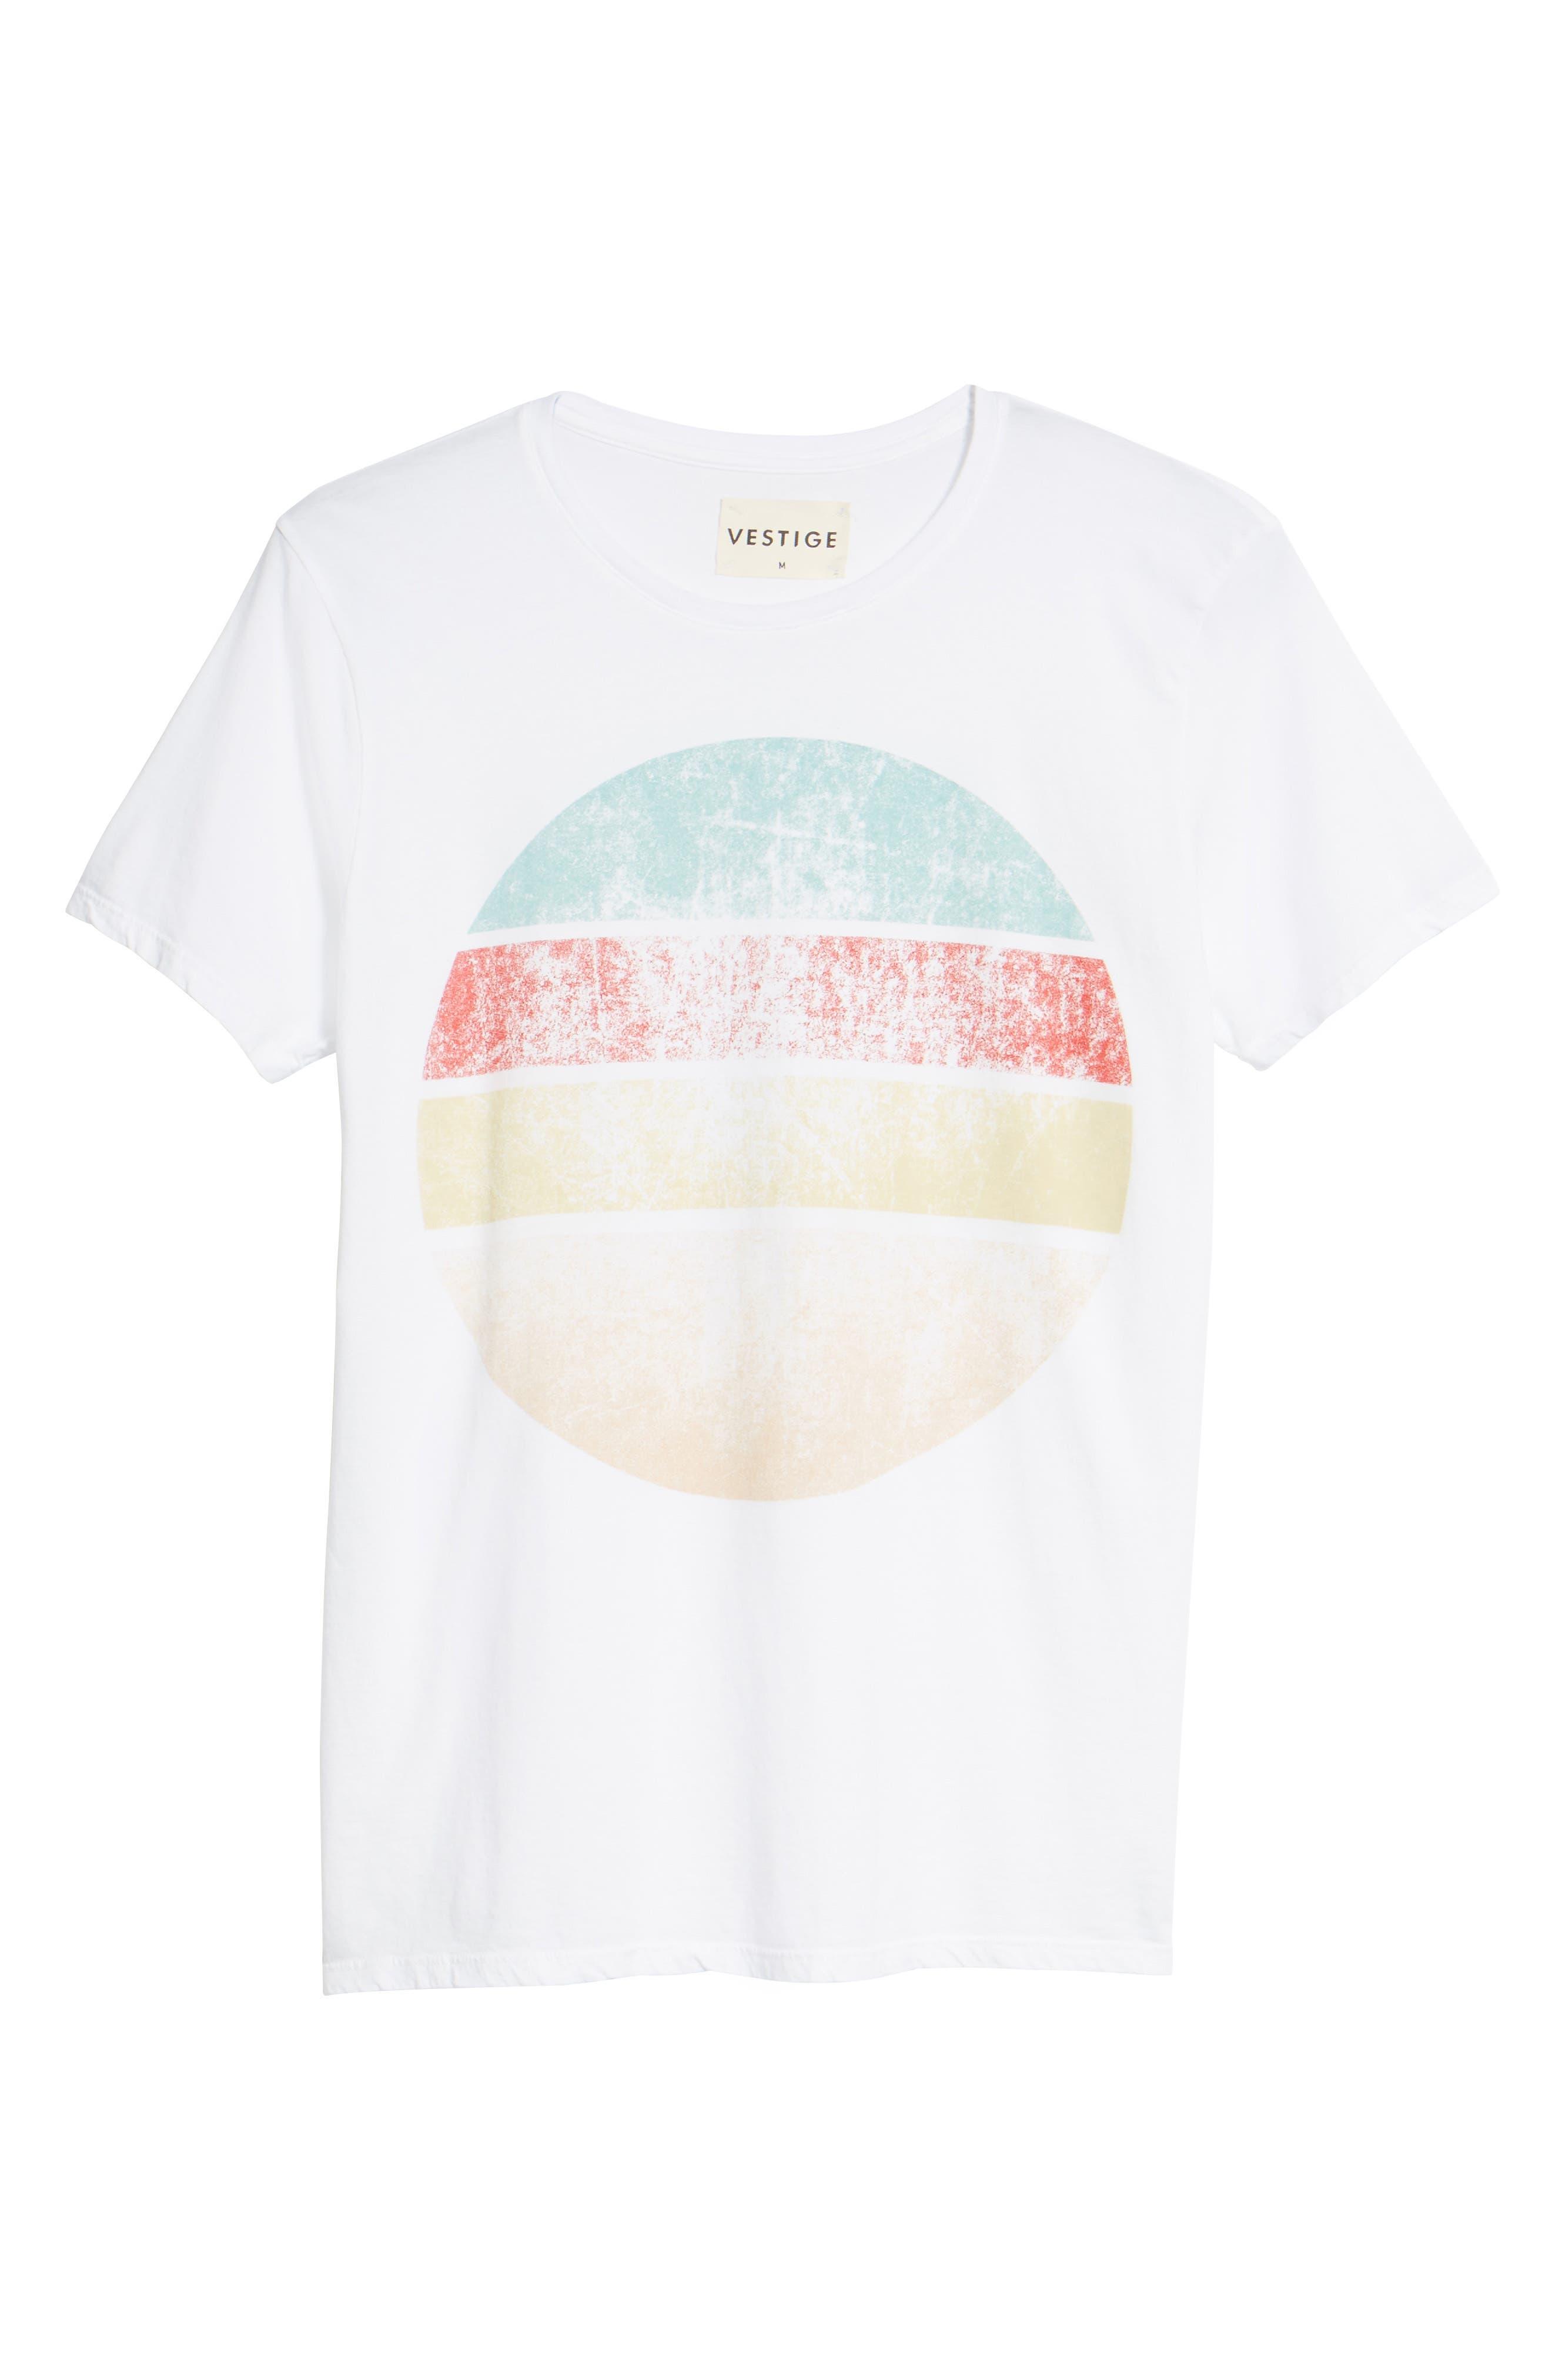 Western Sun T-Shirt,                             Alternate thumbnail 6, color,                             100